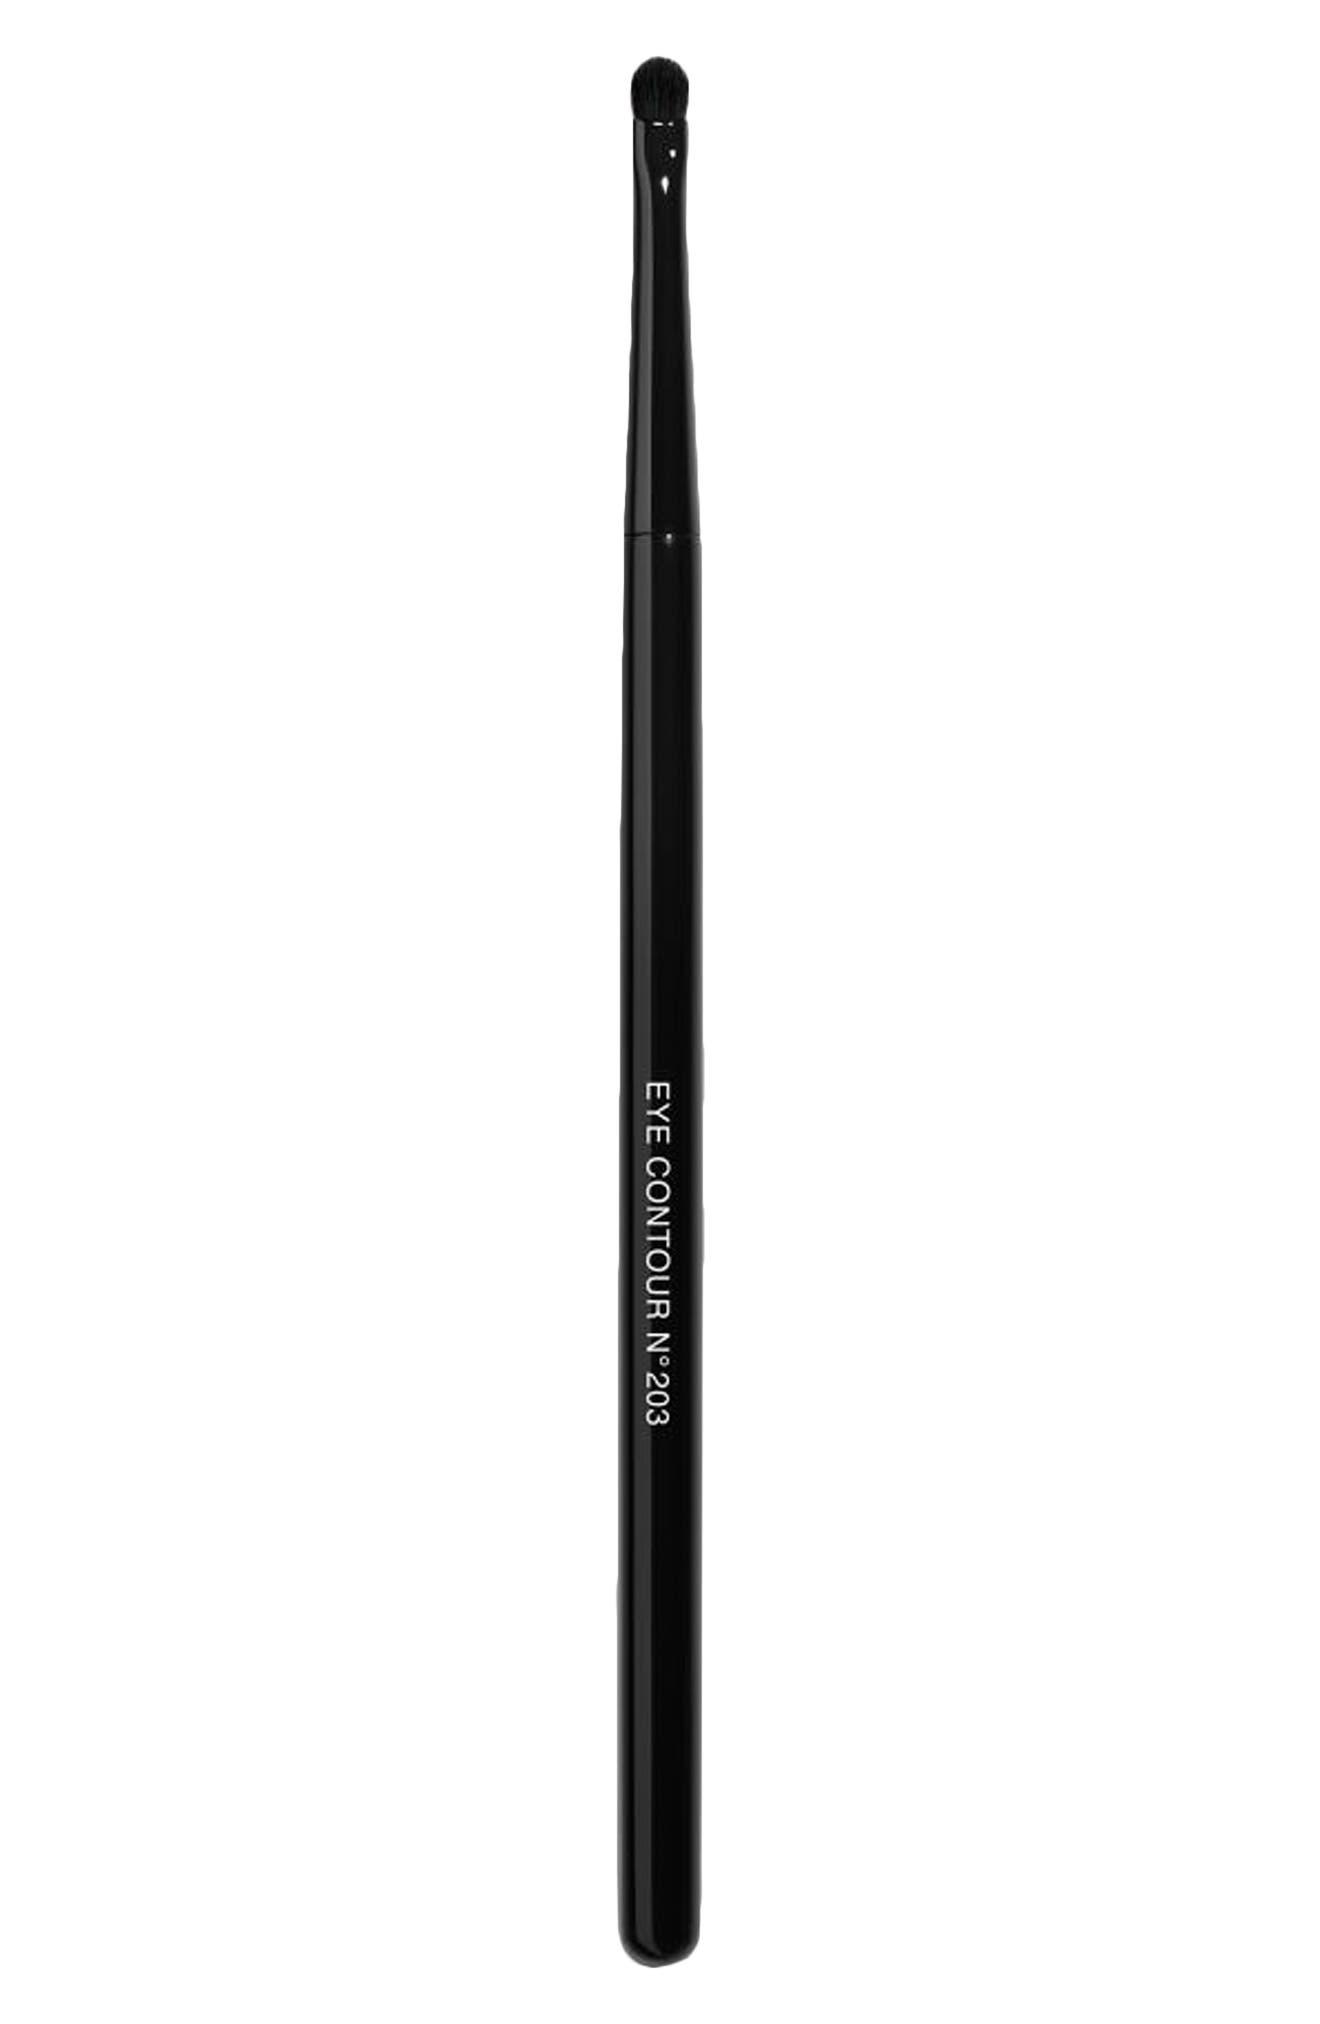 CHANEL LES PINCEAUX DE CHANEL Eye Contouring Brush N°203   Nordstrom